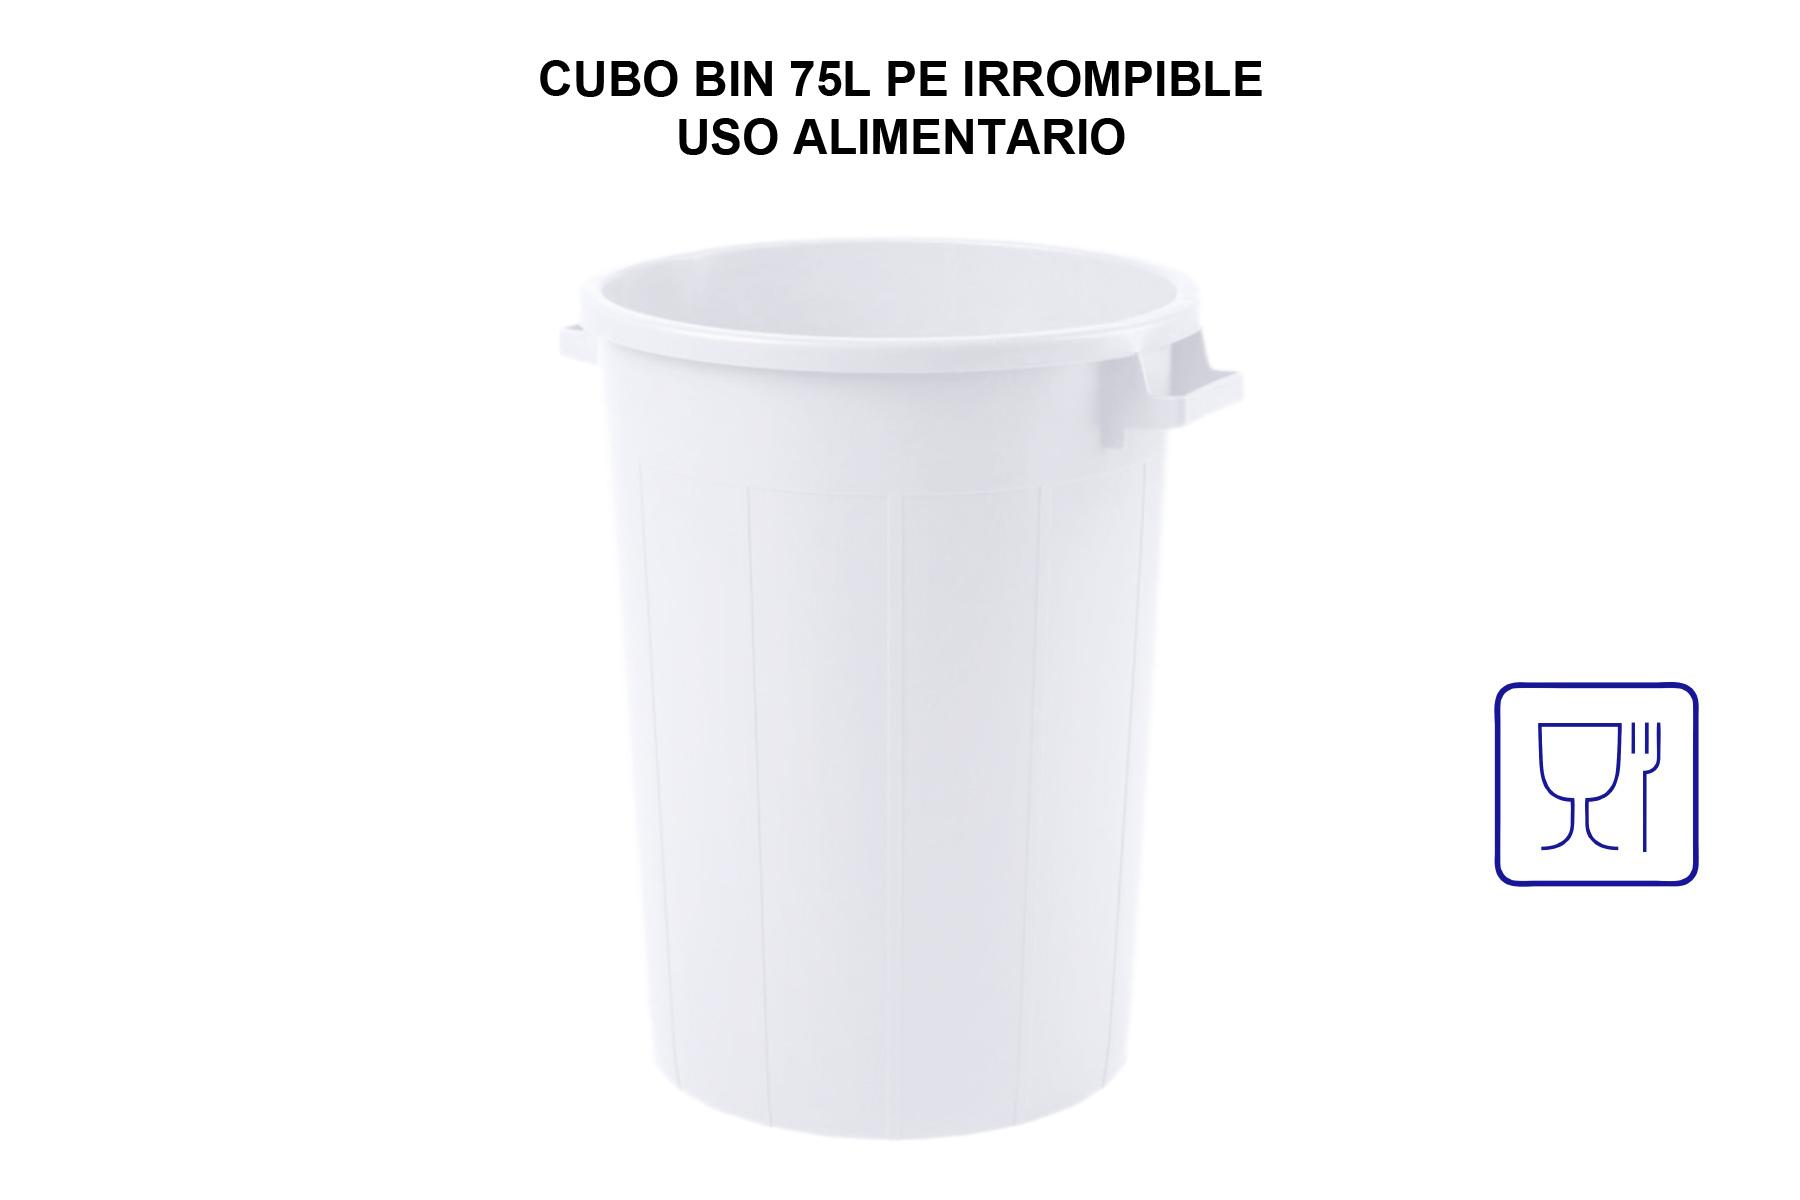 CUBO BIN 75L PE IRROMPIBLE USO ALIMENTARIO